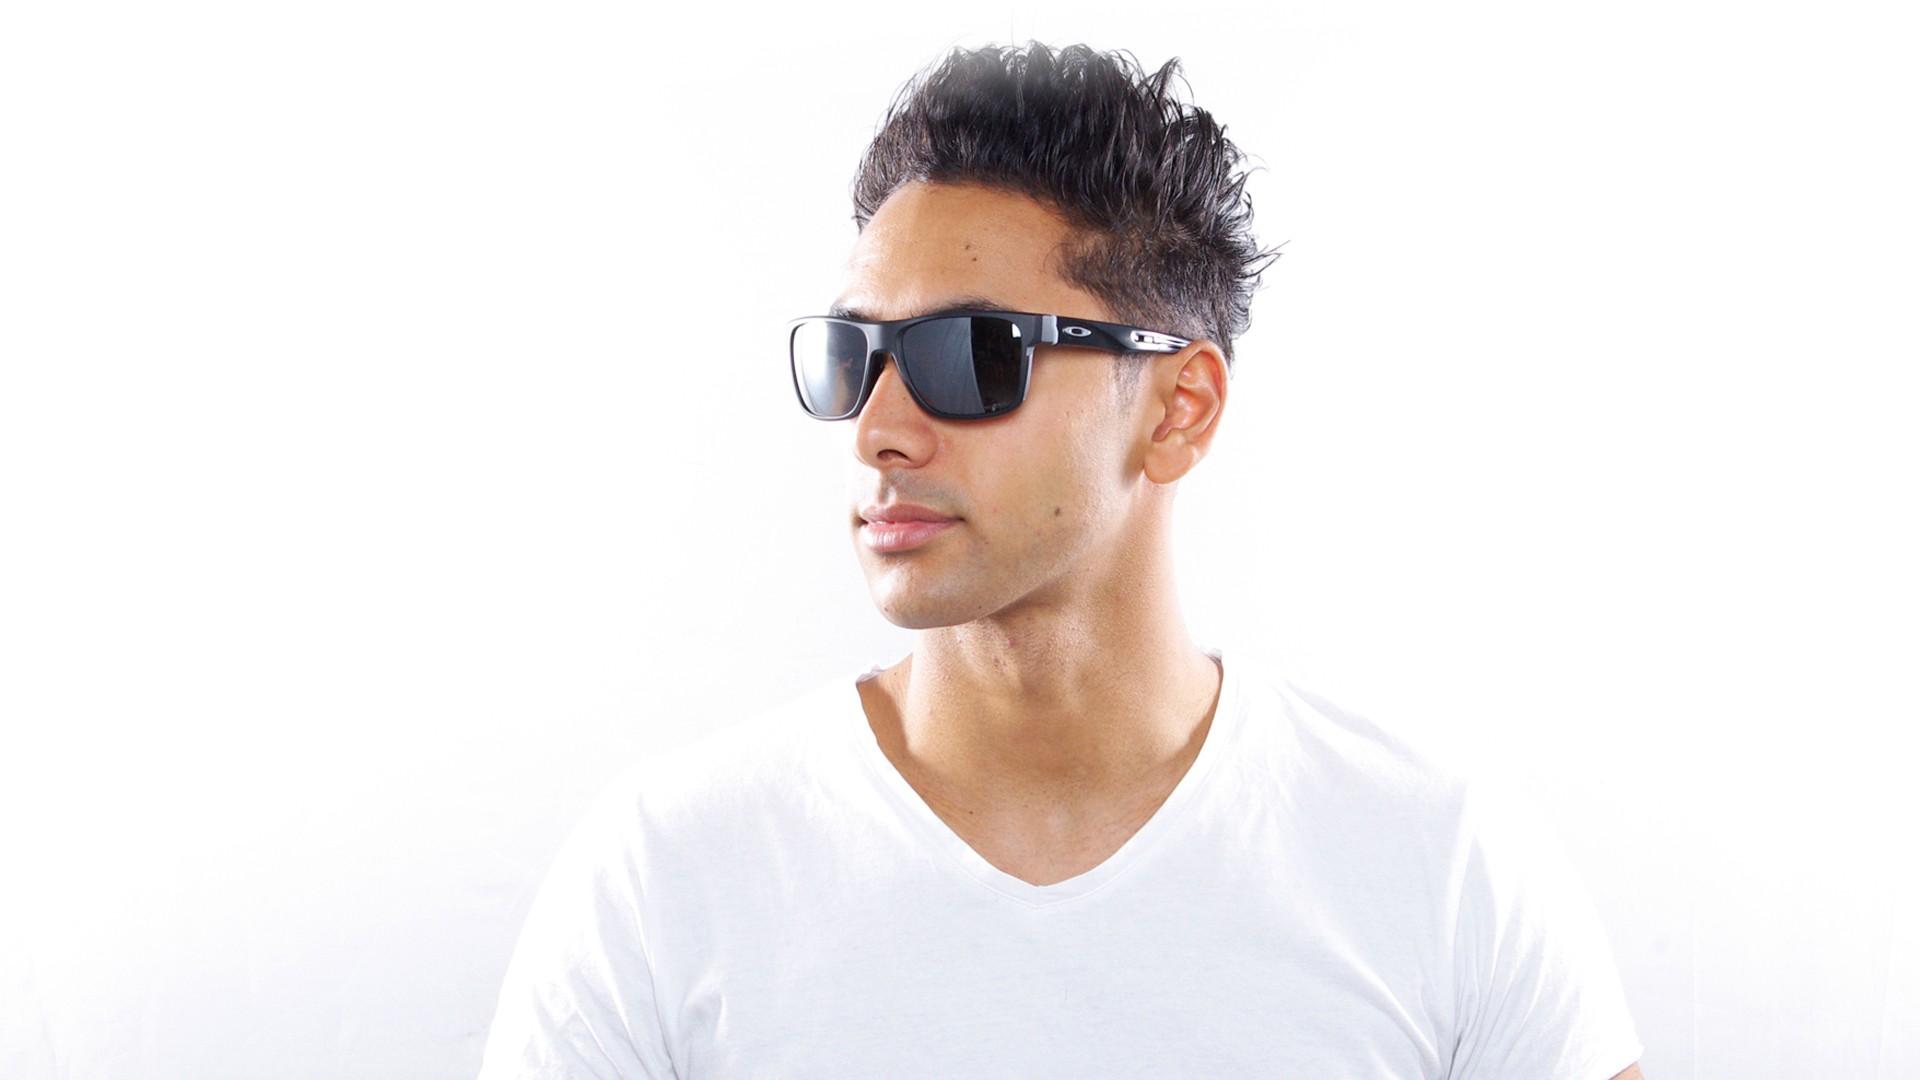 62c9b1b6000 Sunglasses Oakley Crossrange Black Mat Prizm OO9361 06 57-17 Medium  Polarized Flash